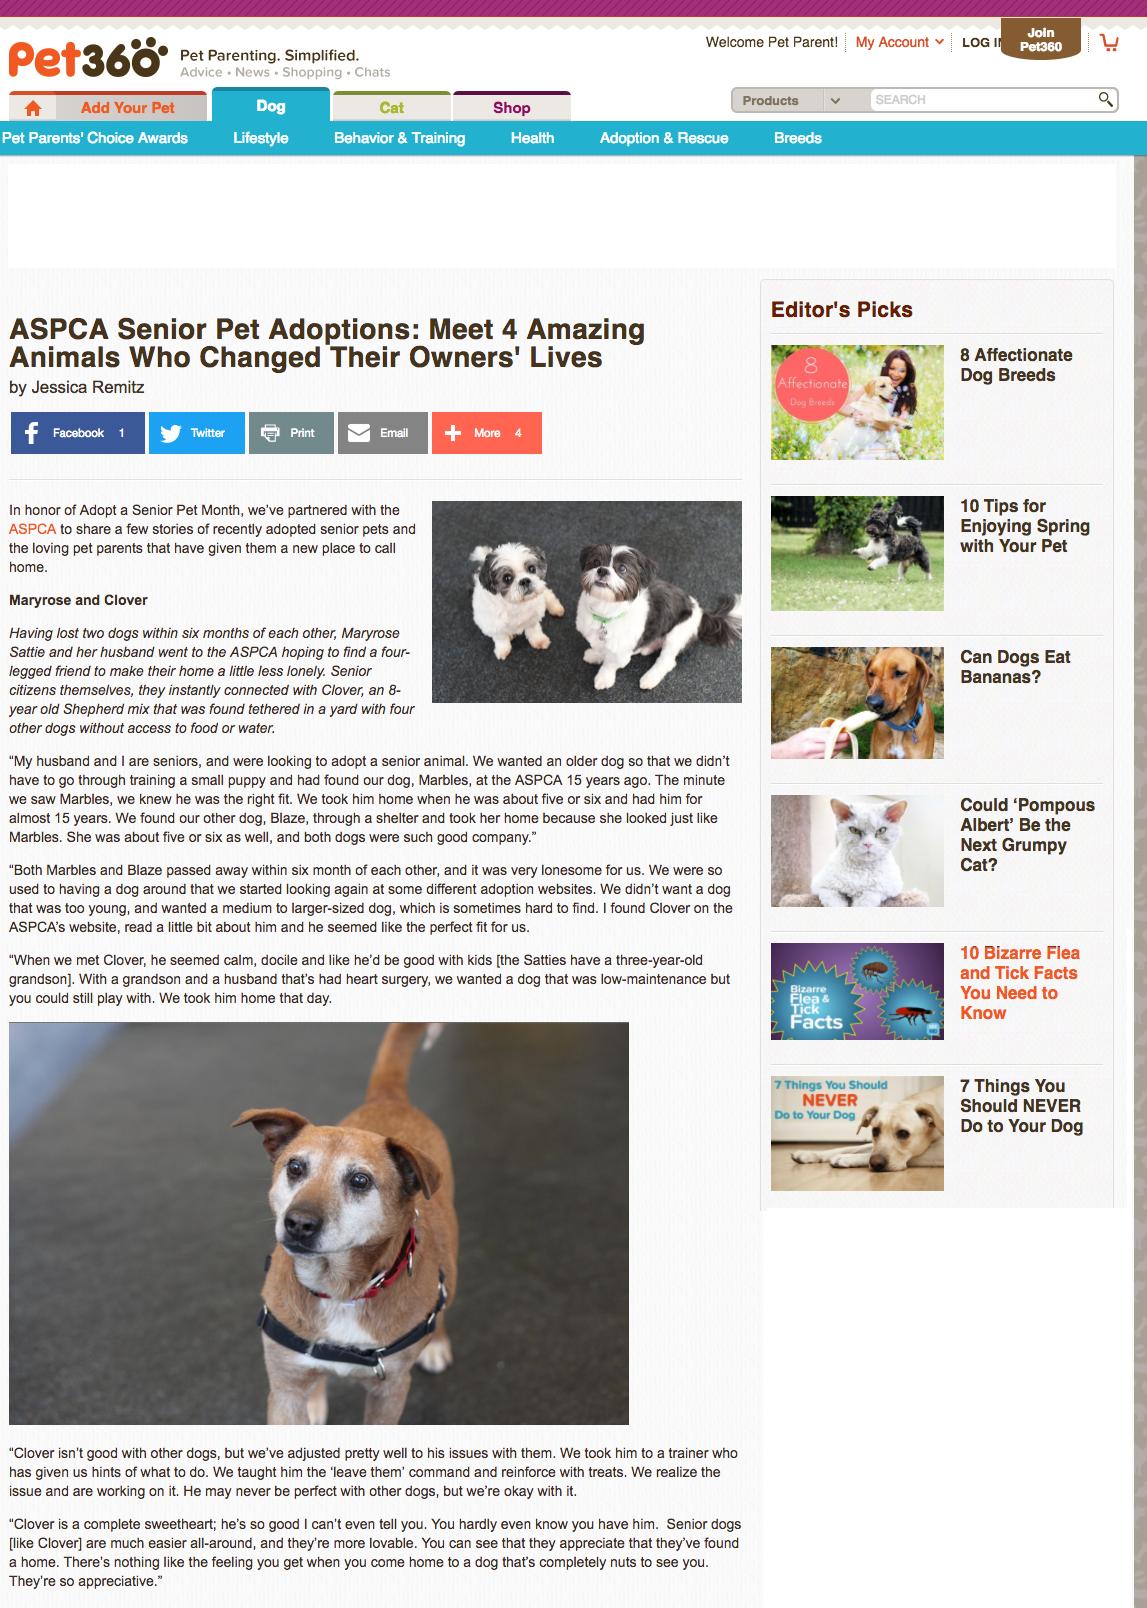 ASCPA Senior Pet Adoptions_Pet360 copy.png